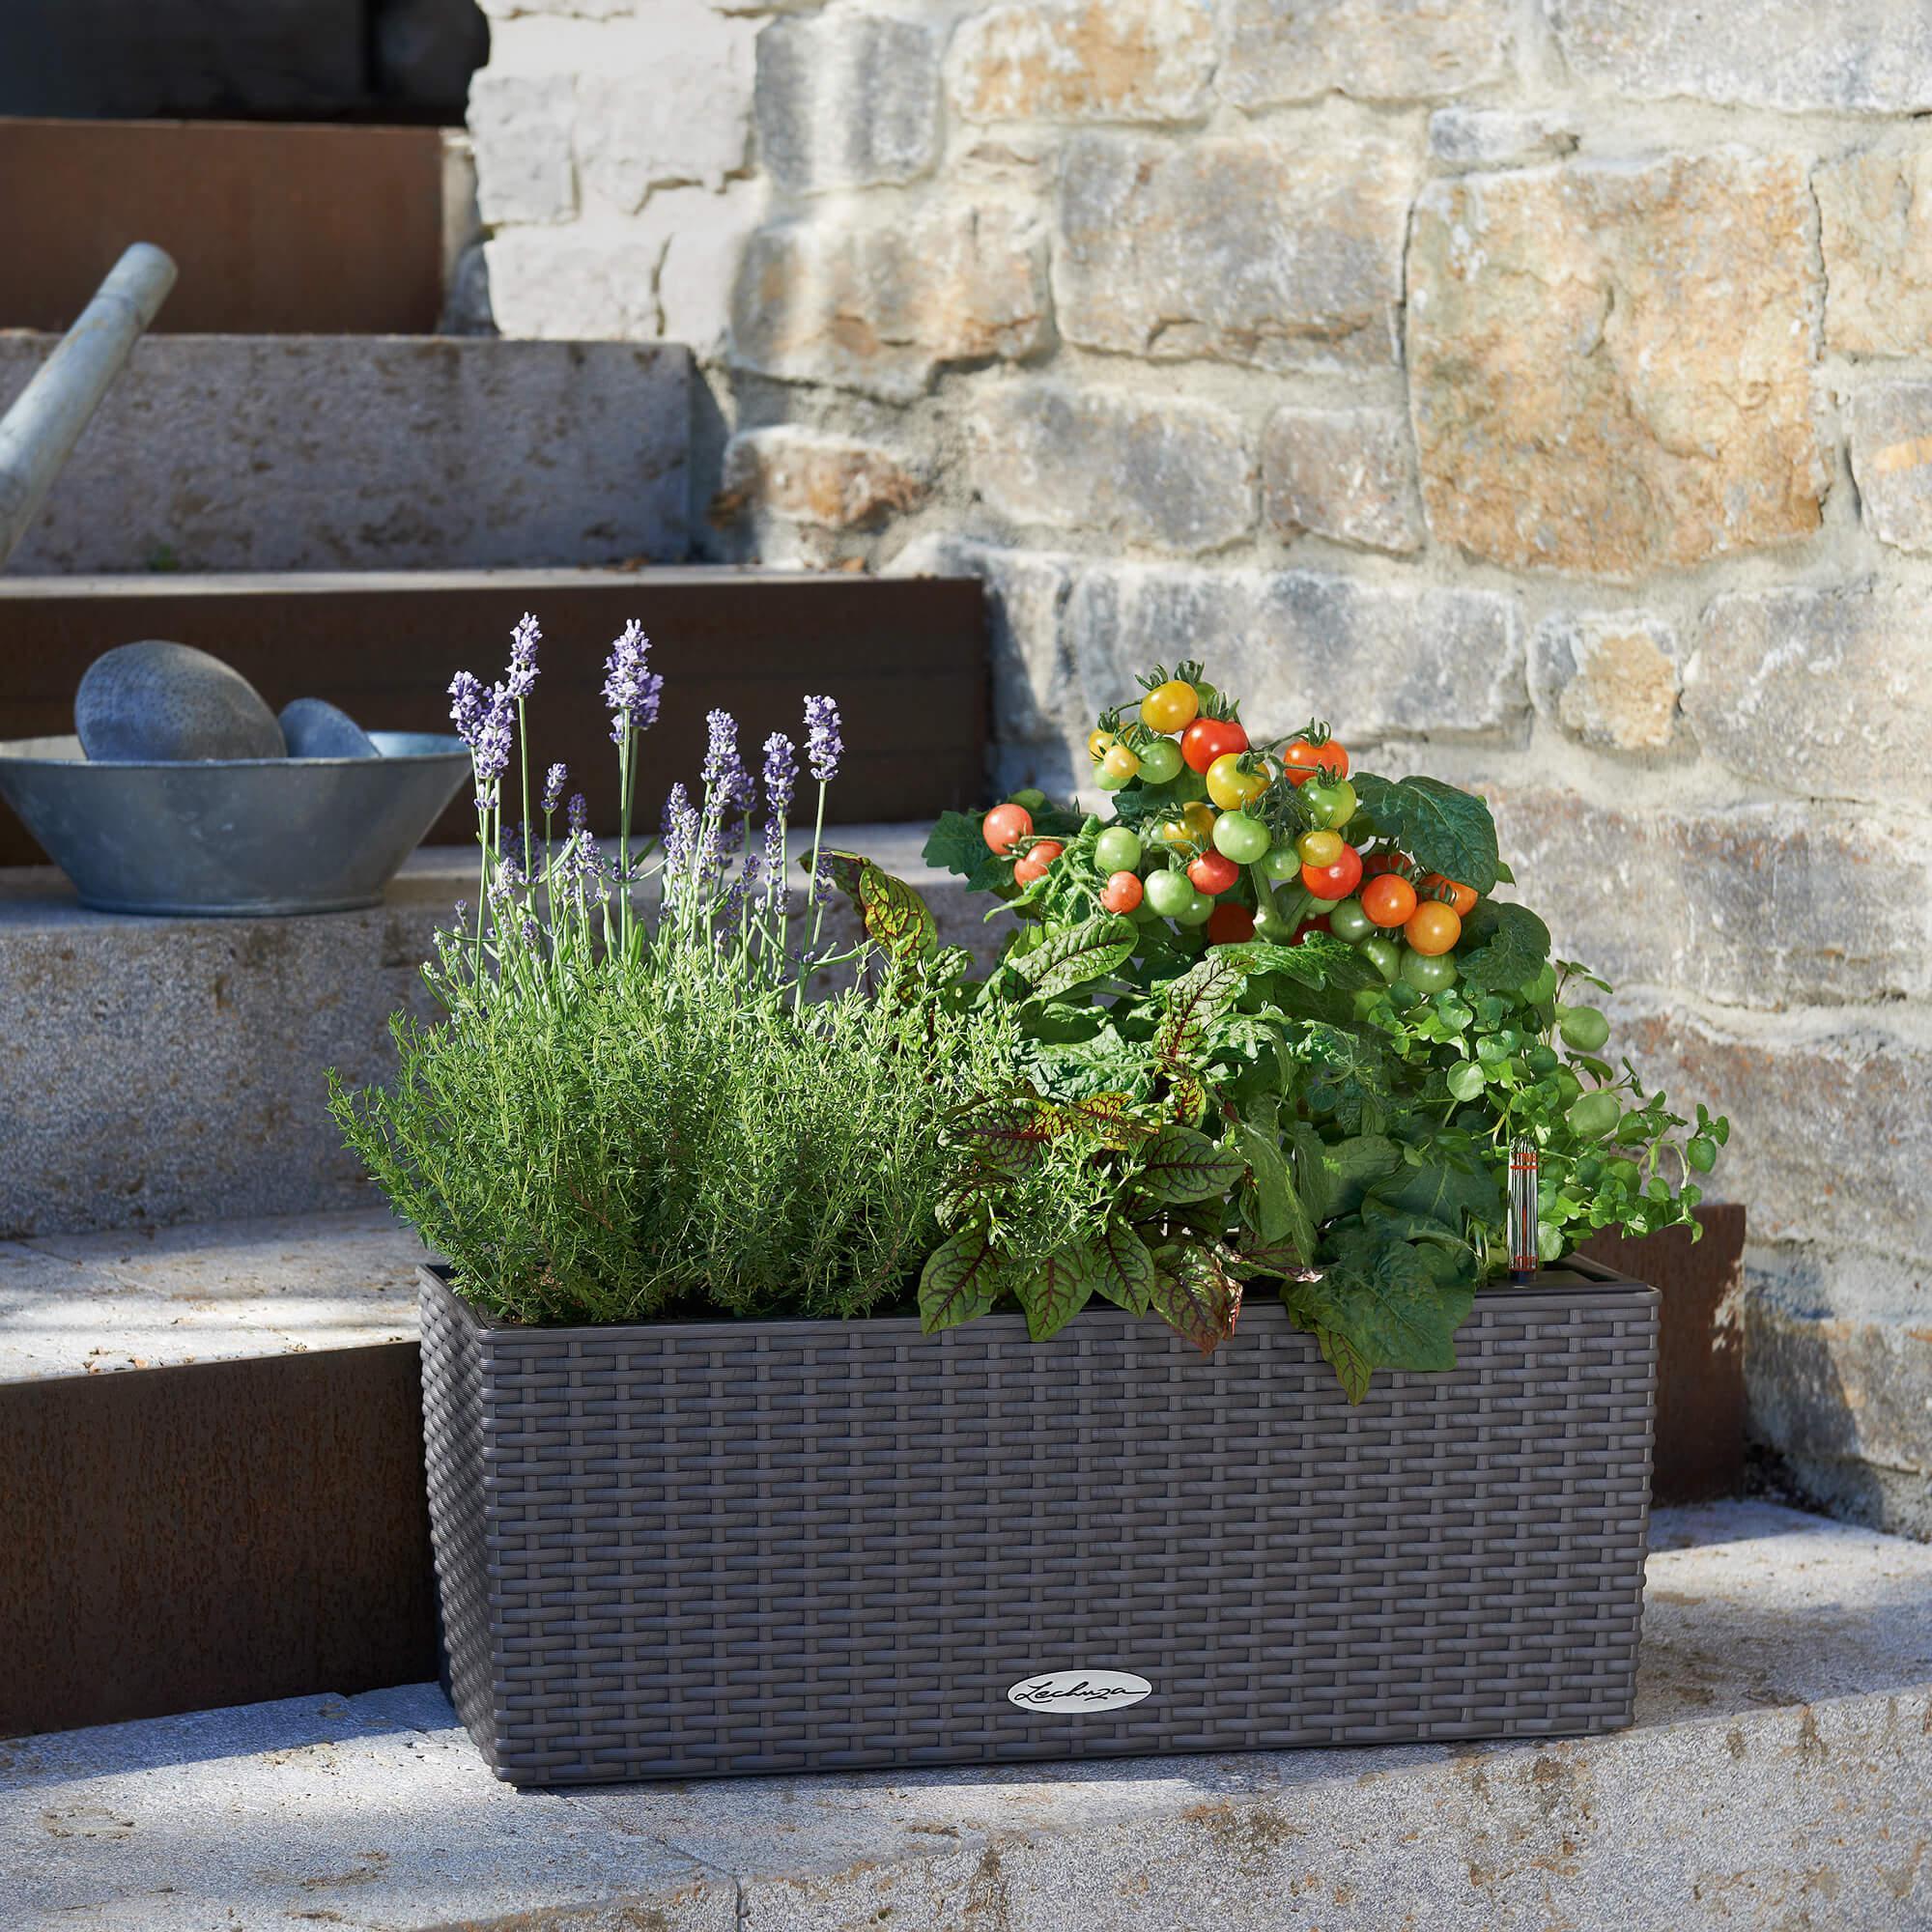 le_balconera-cottage50_product_addi_03